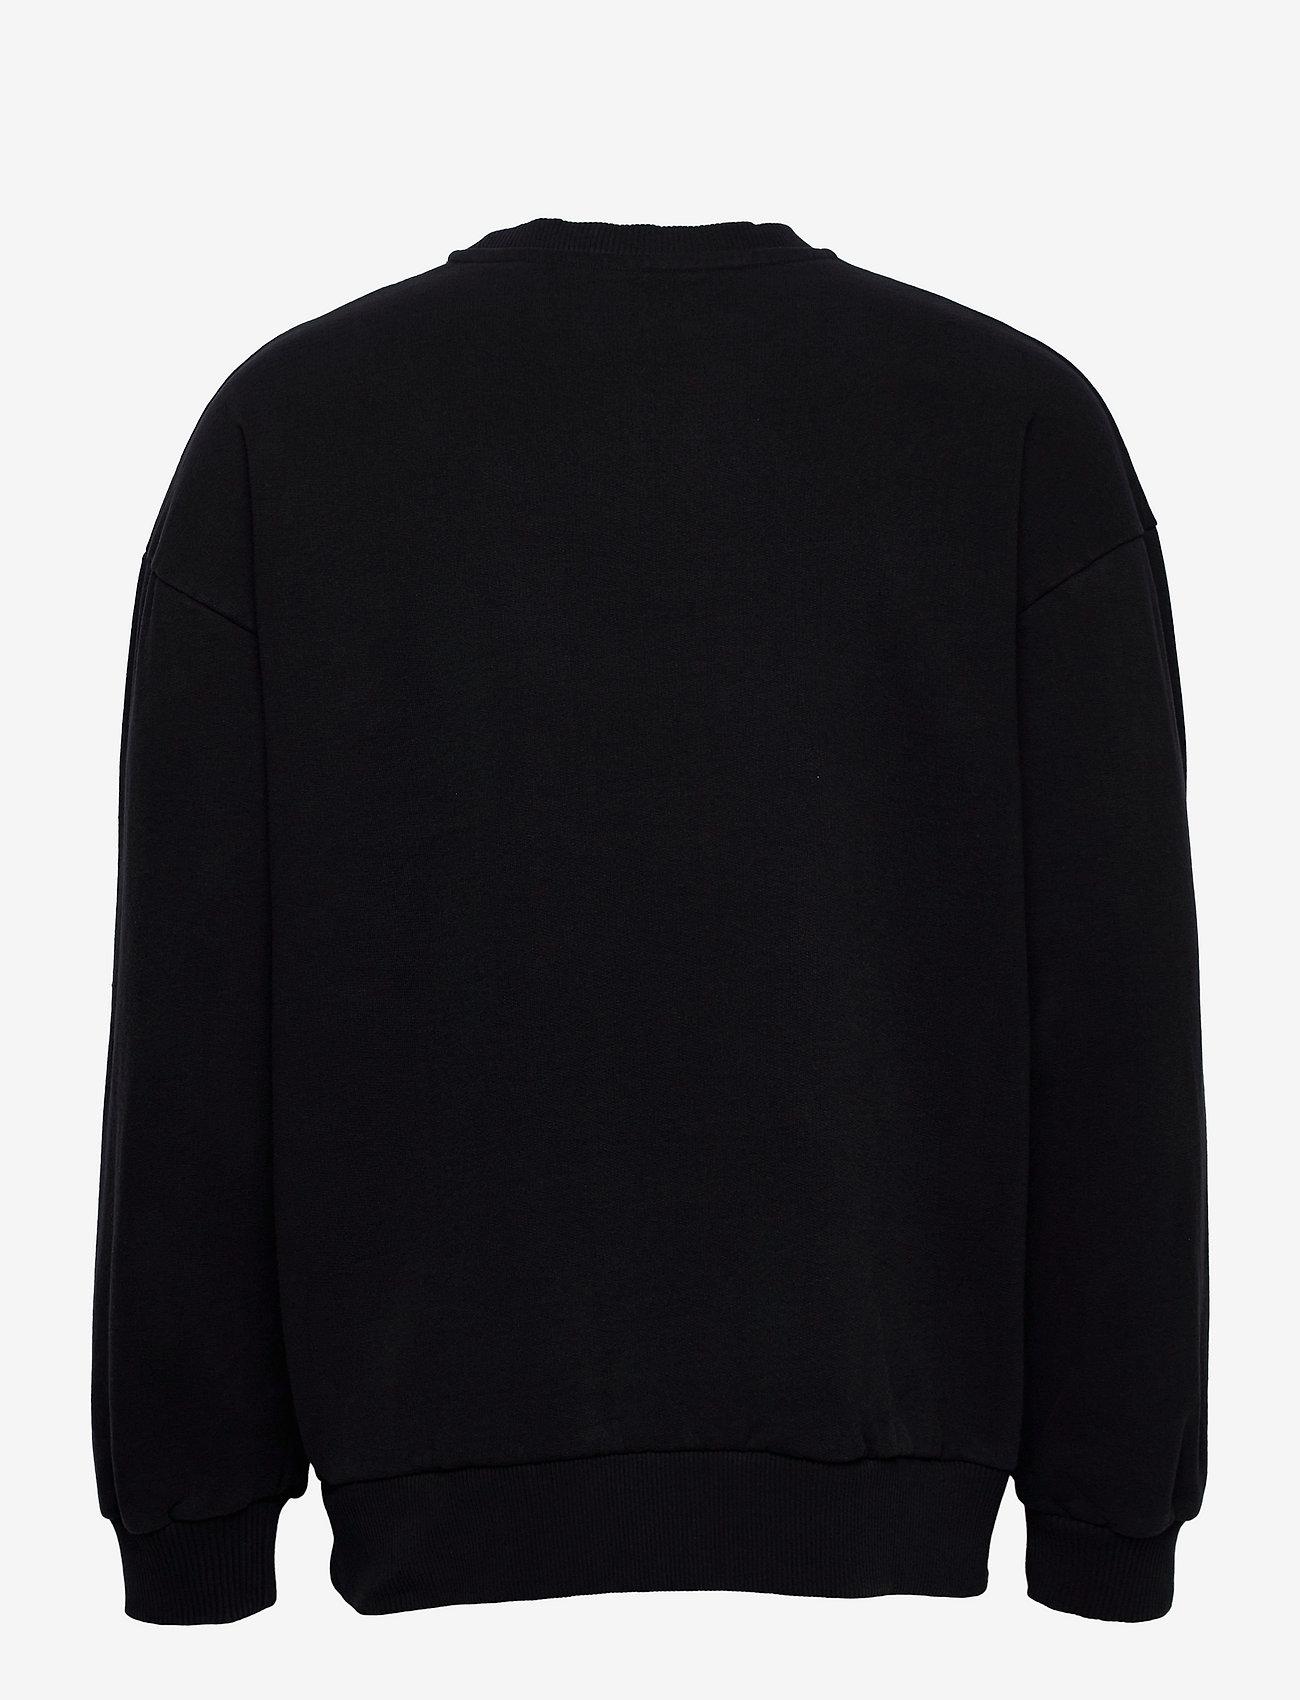 HAN Kjøbenhavn - Bulky Crew - truien - faded black - 1